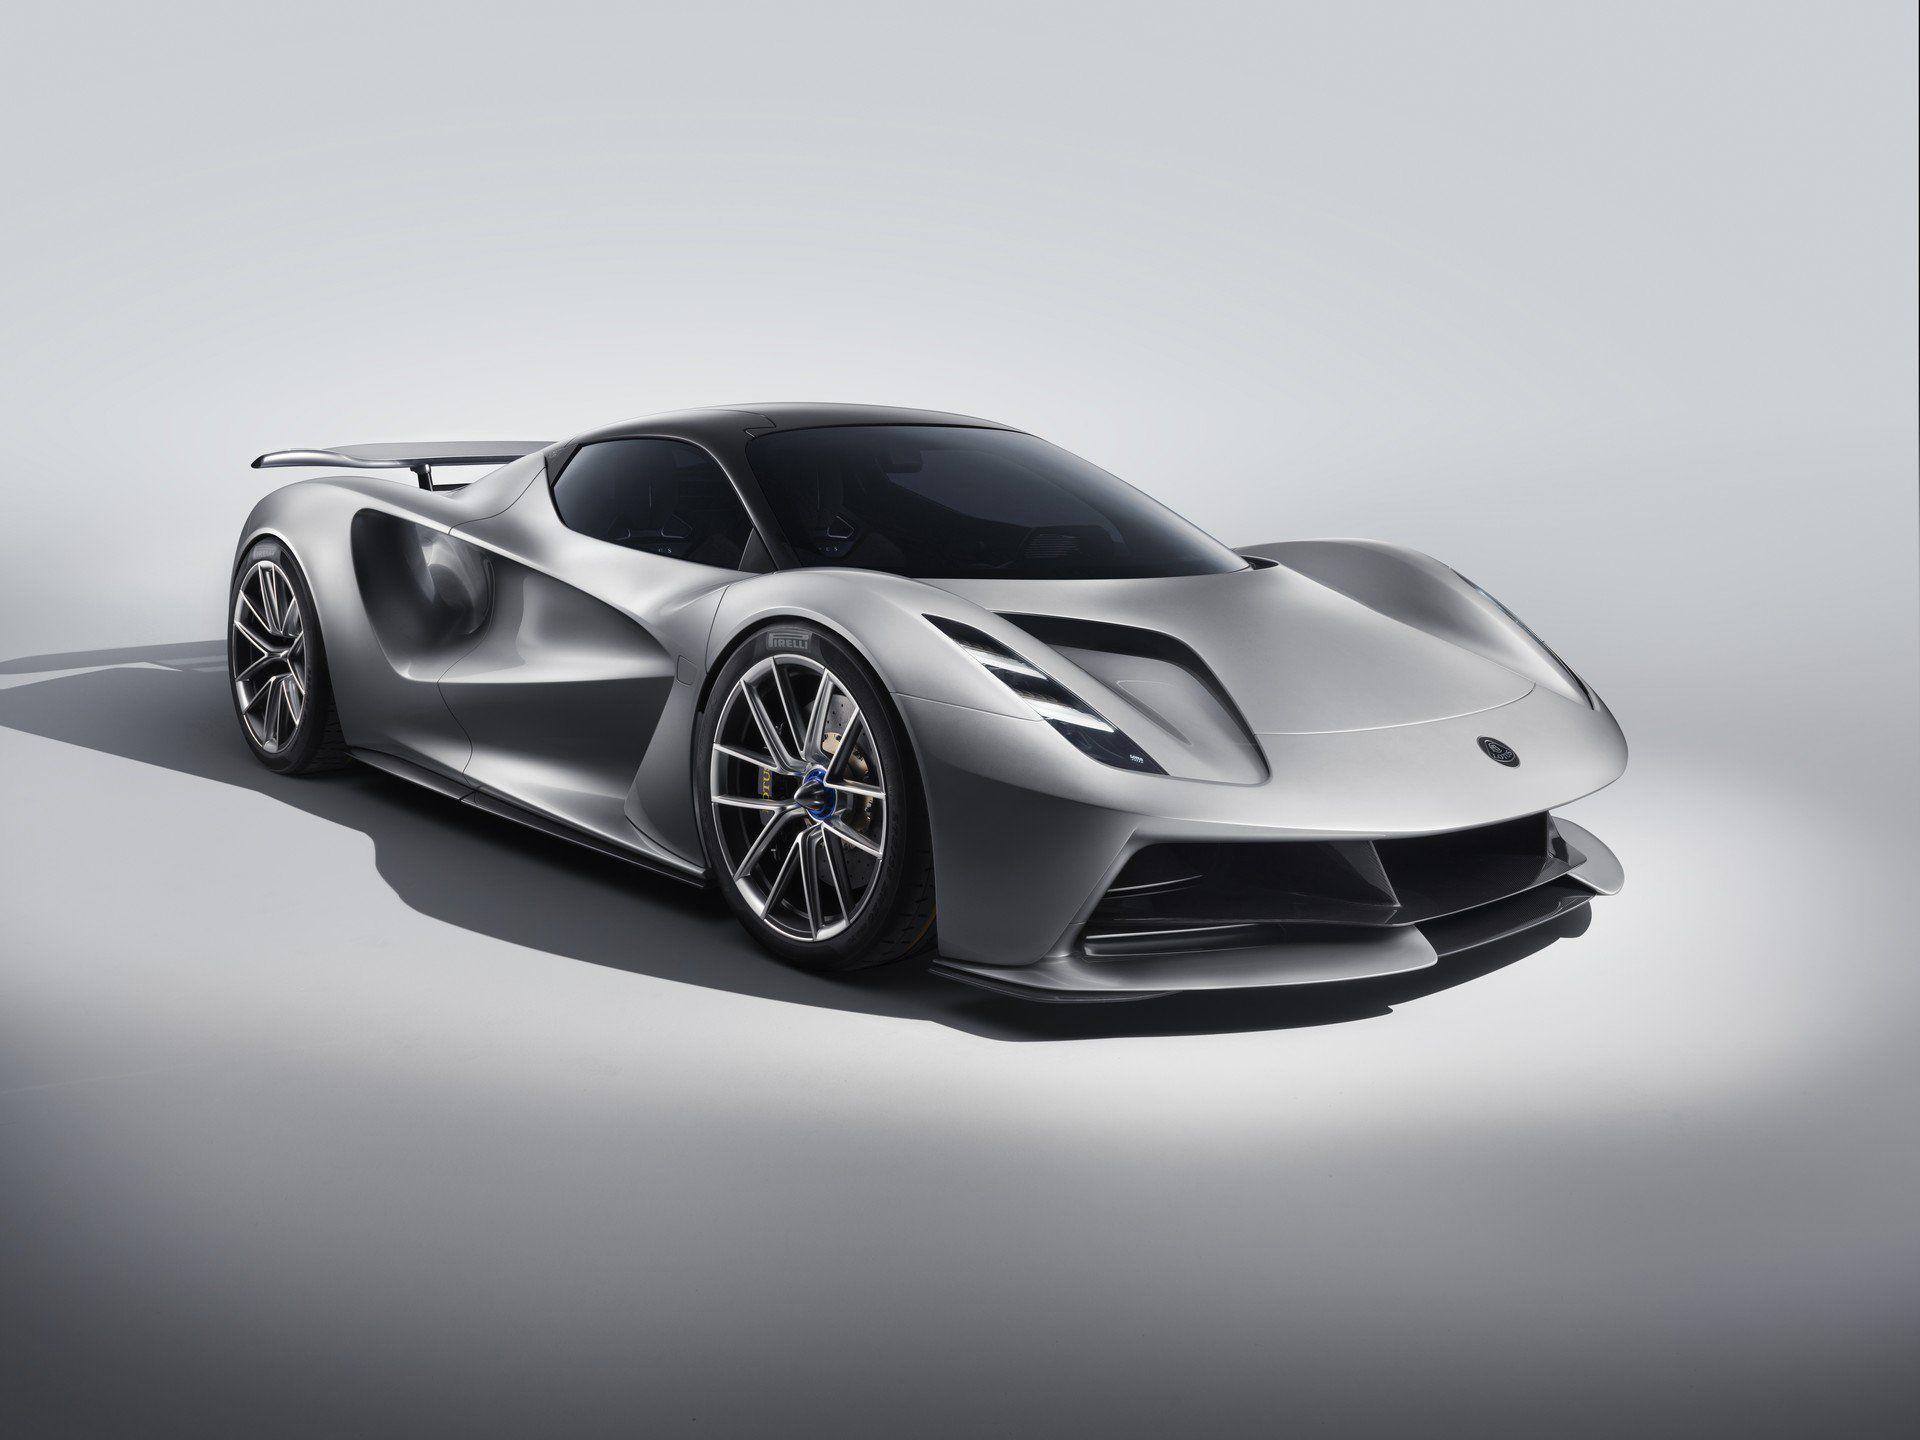 The 2020 Lotus Evija A 2 000hp Ev That Starts At 2 1 Million Lotus Supercars Net In 2020 Super Cars British Cars Lotus Car